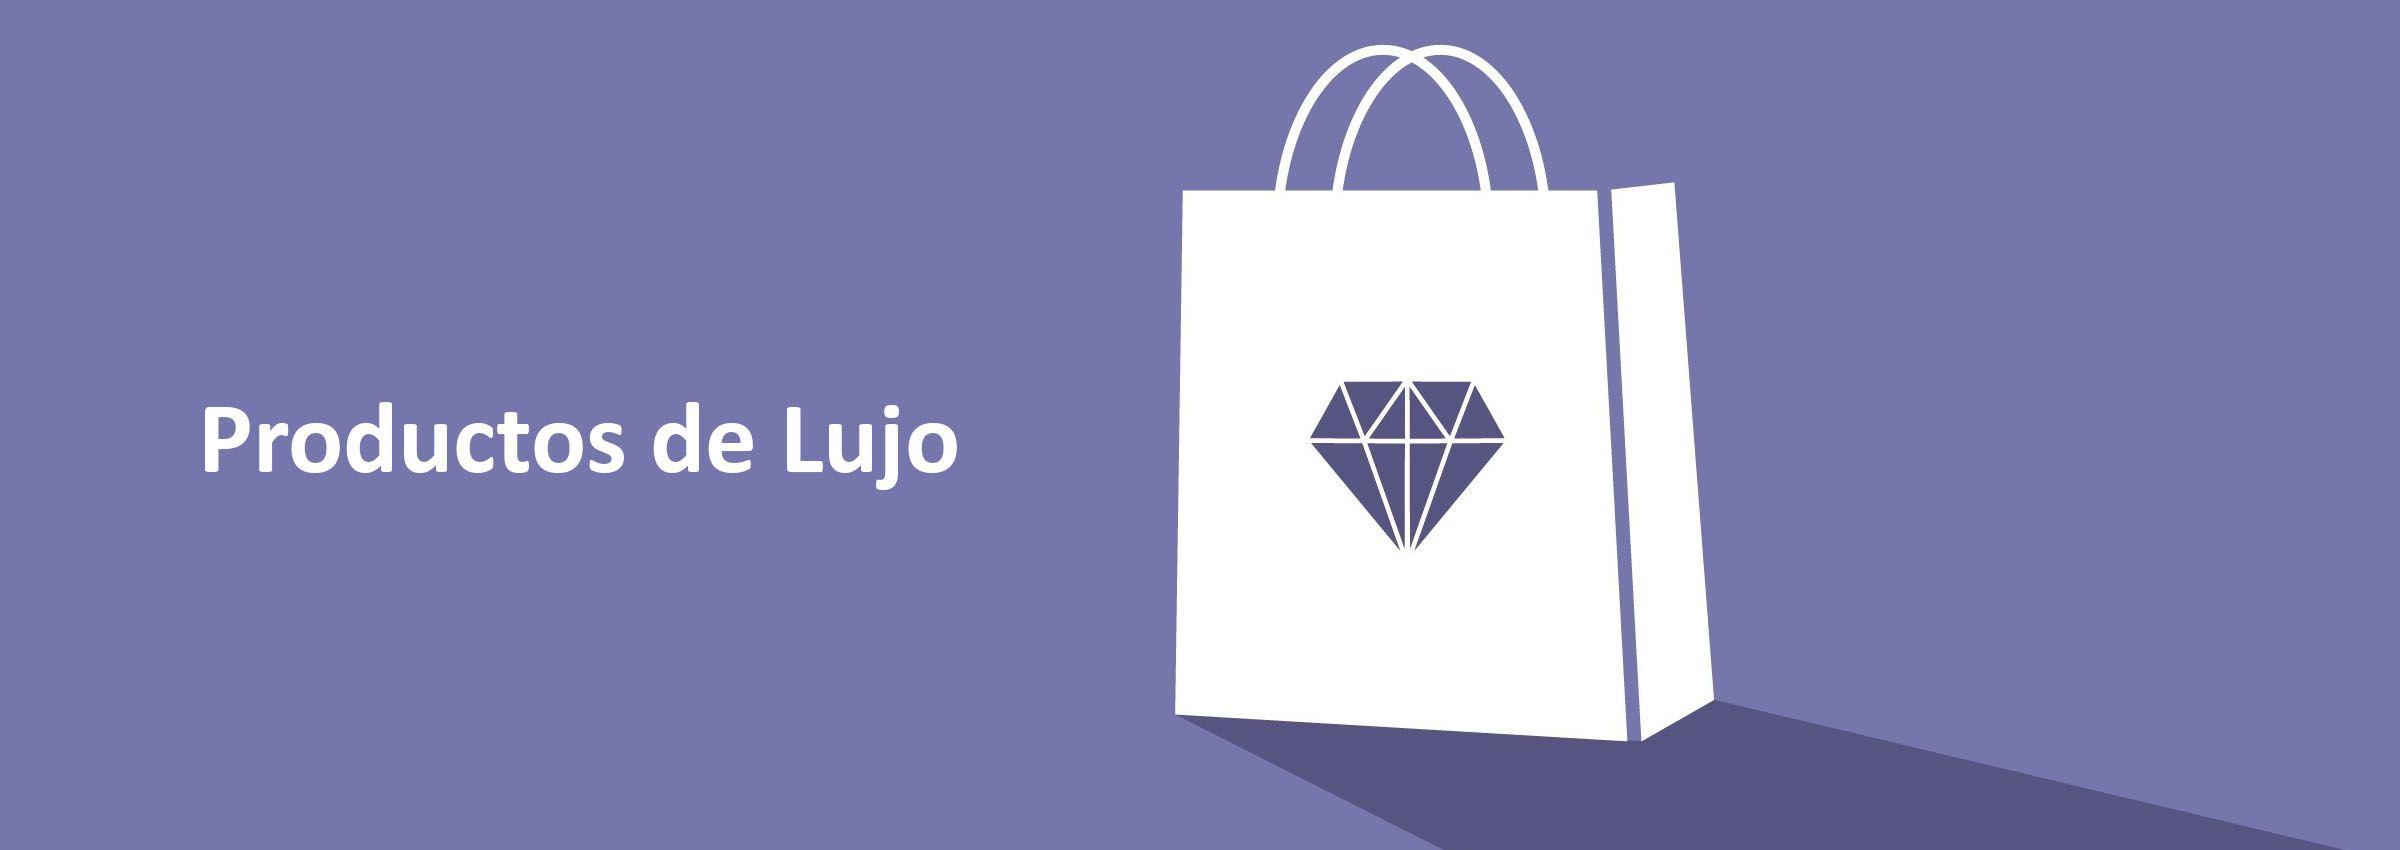 Vender productos o servicios caros online